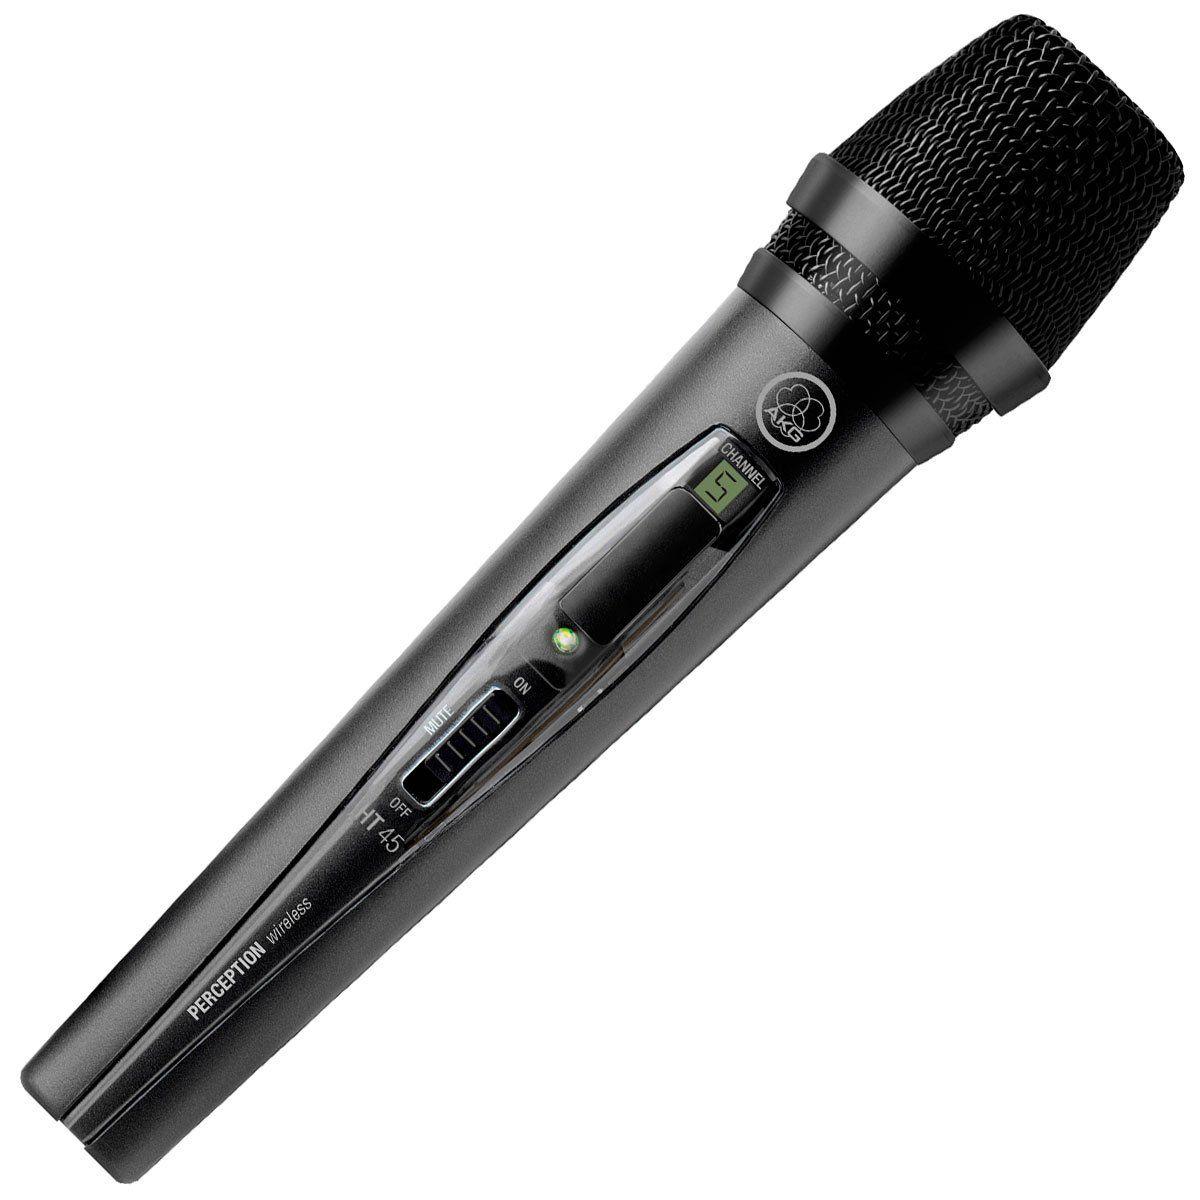 Microfone sem Fio AKG PW HT45 Mão UHF SR45